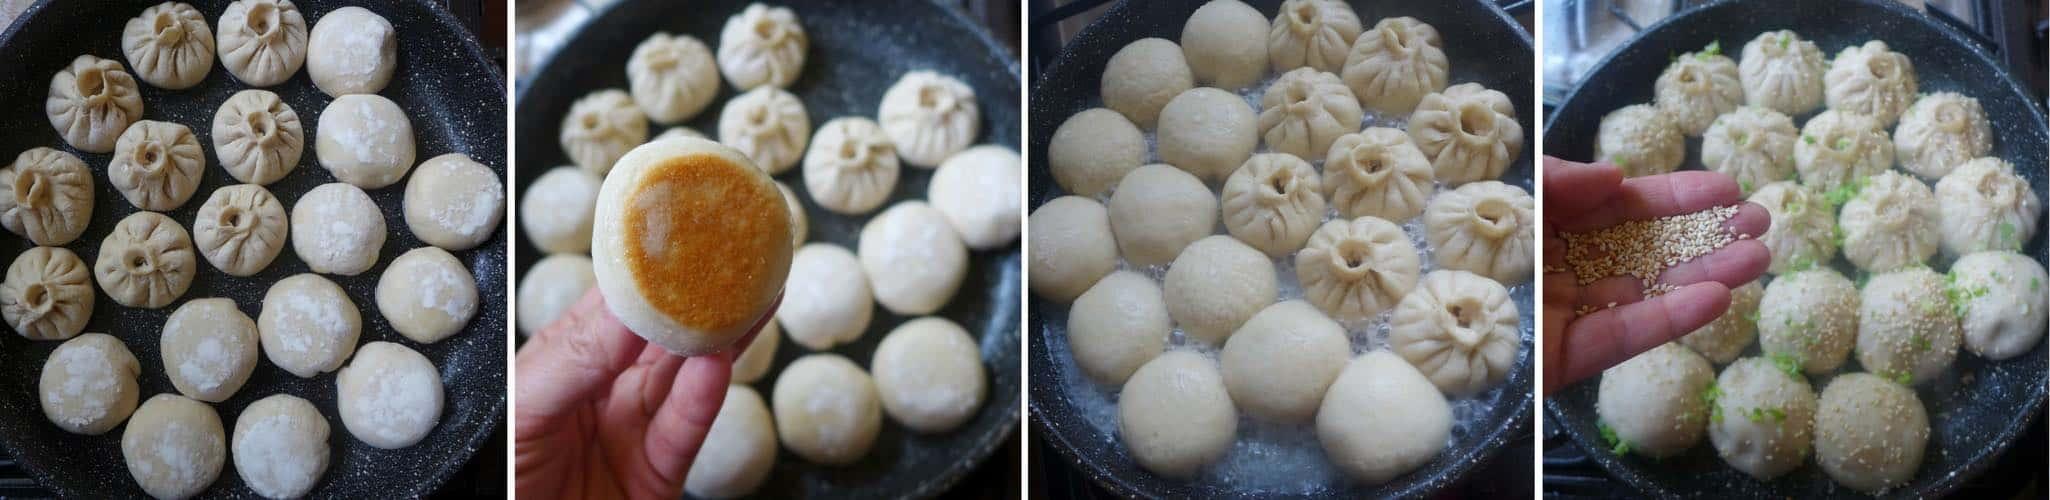 4 step photos showing how to cook Sheng Jian Bao (pan-fried pork buns)